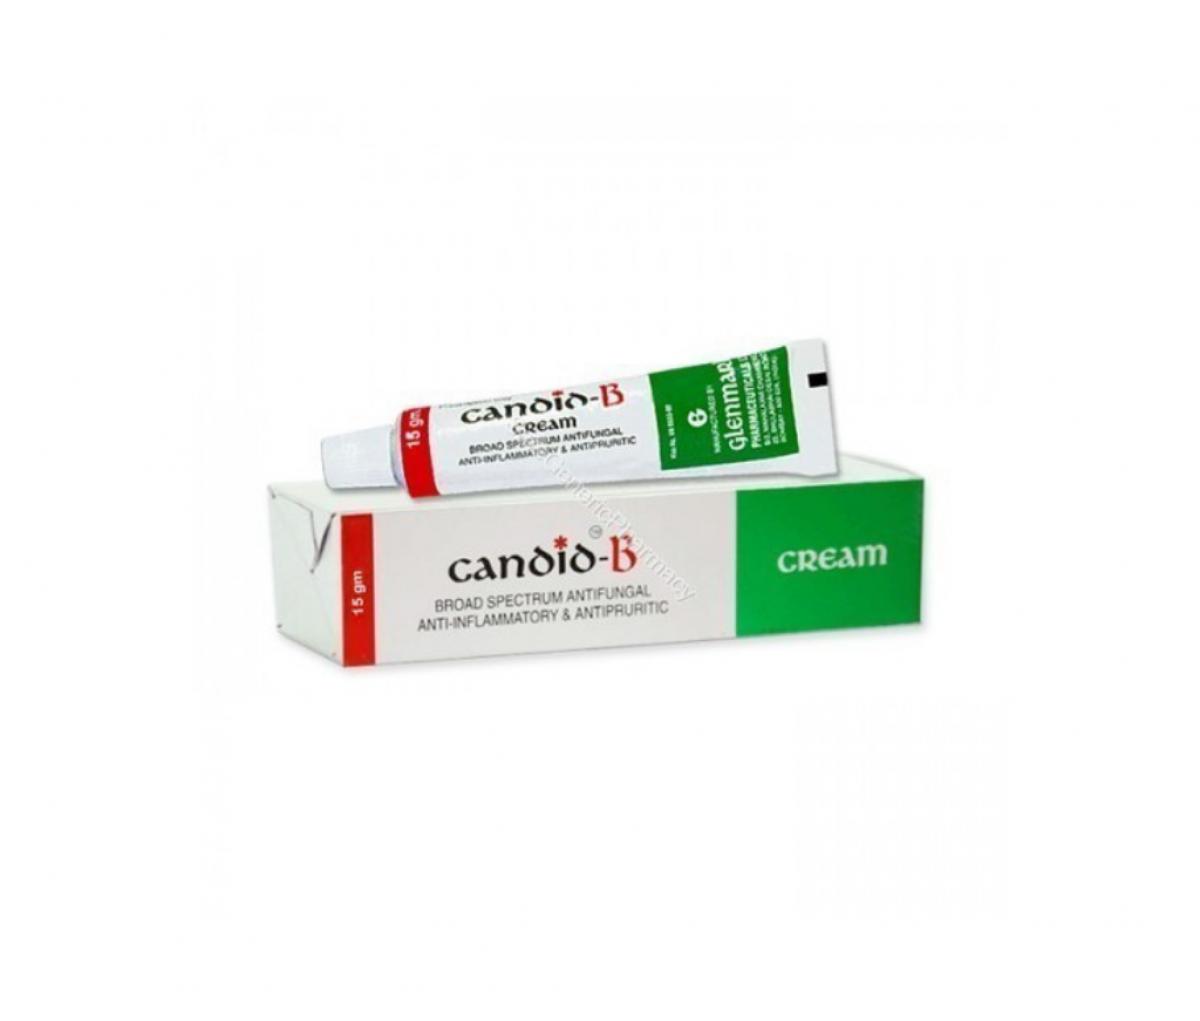 Candid B Cream 15g